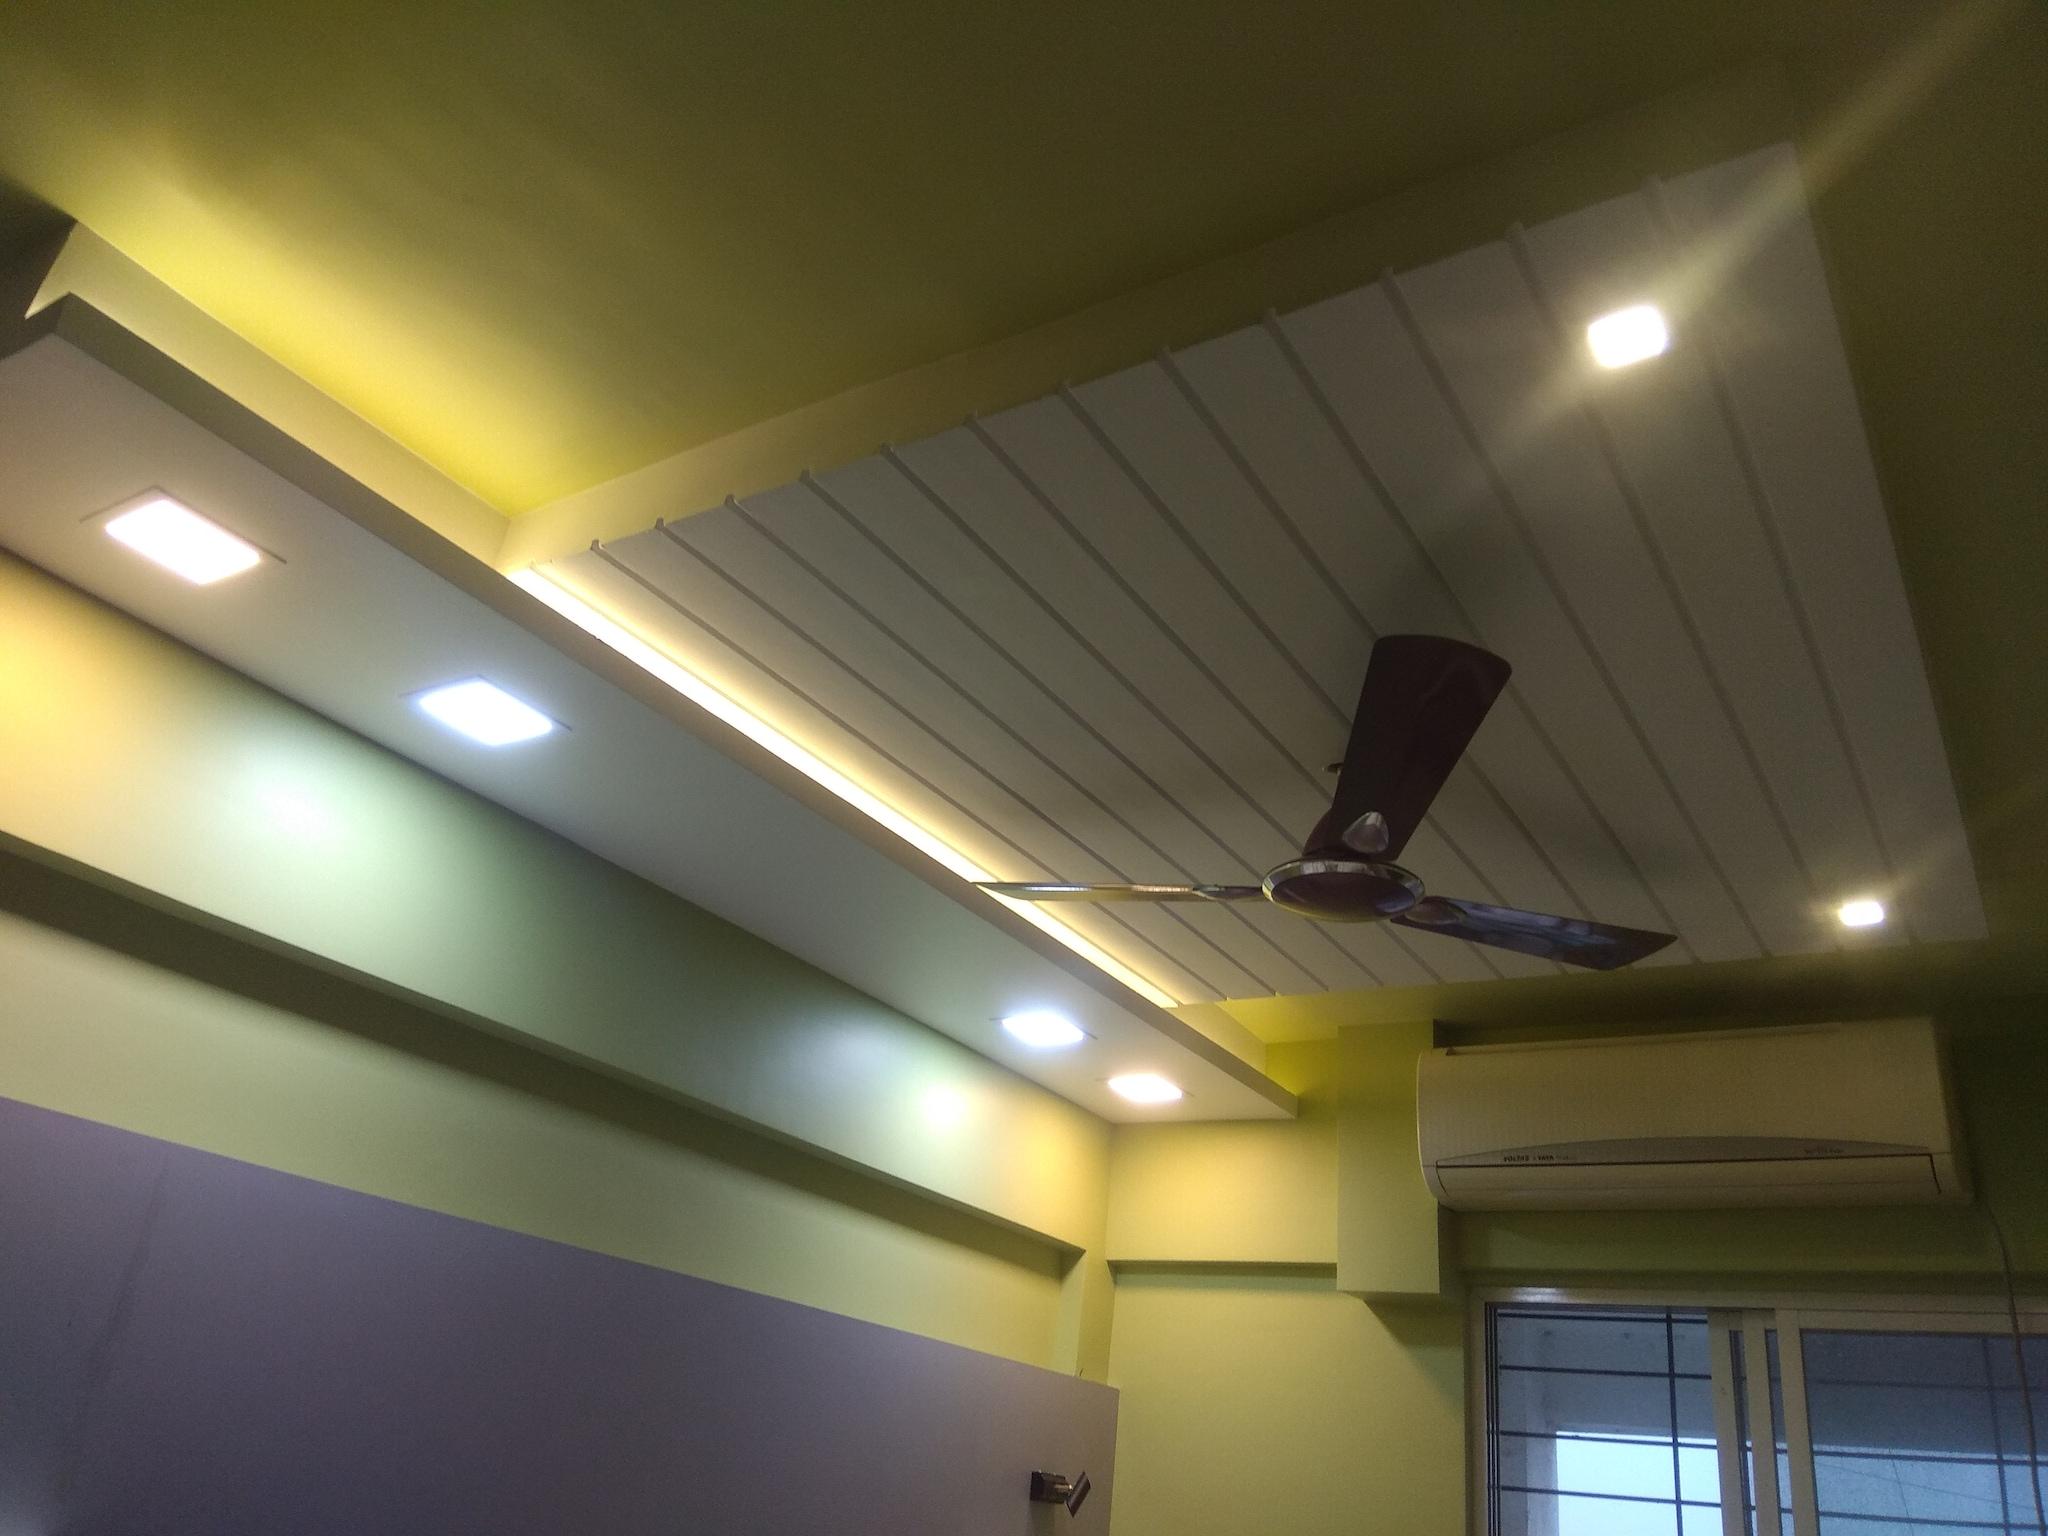 10 Best False Ceiling Contractors in Pune - Justdial